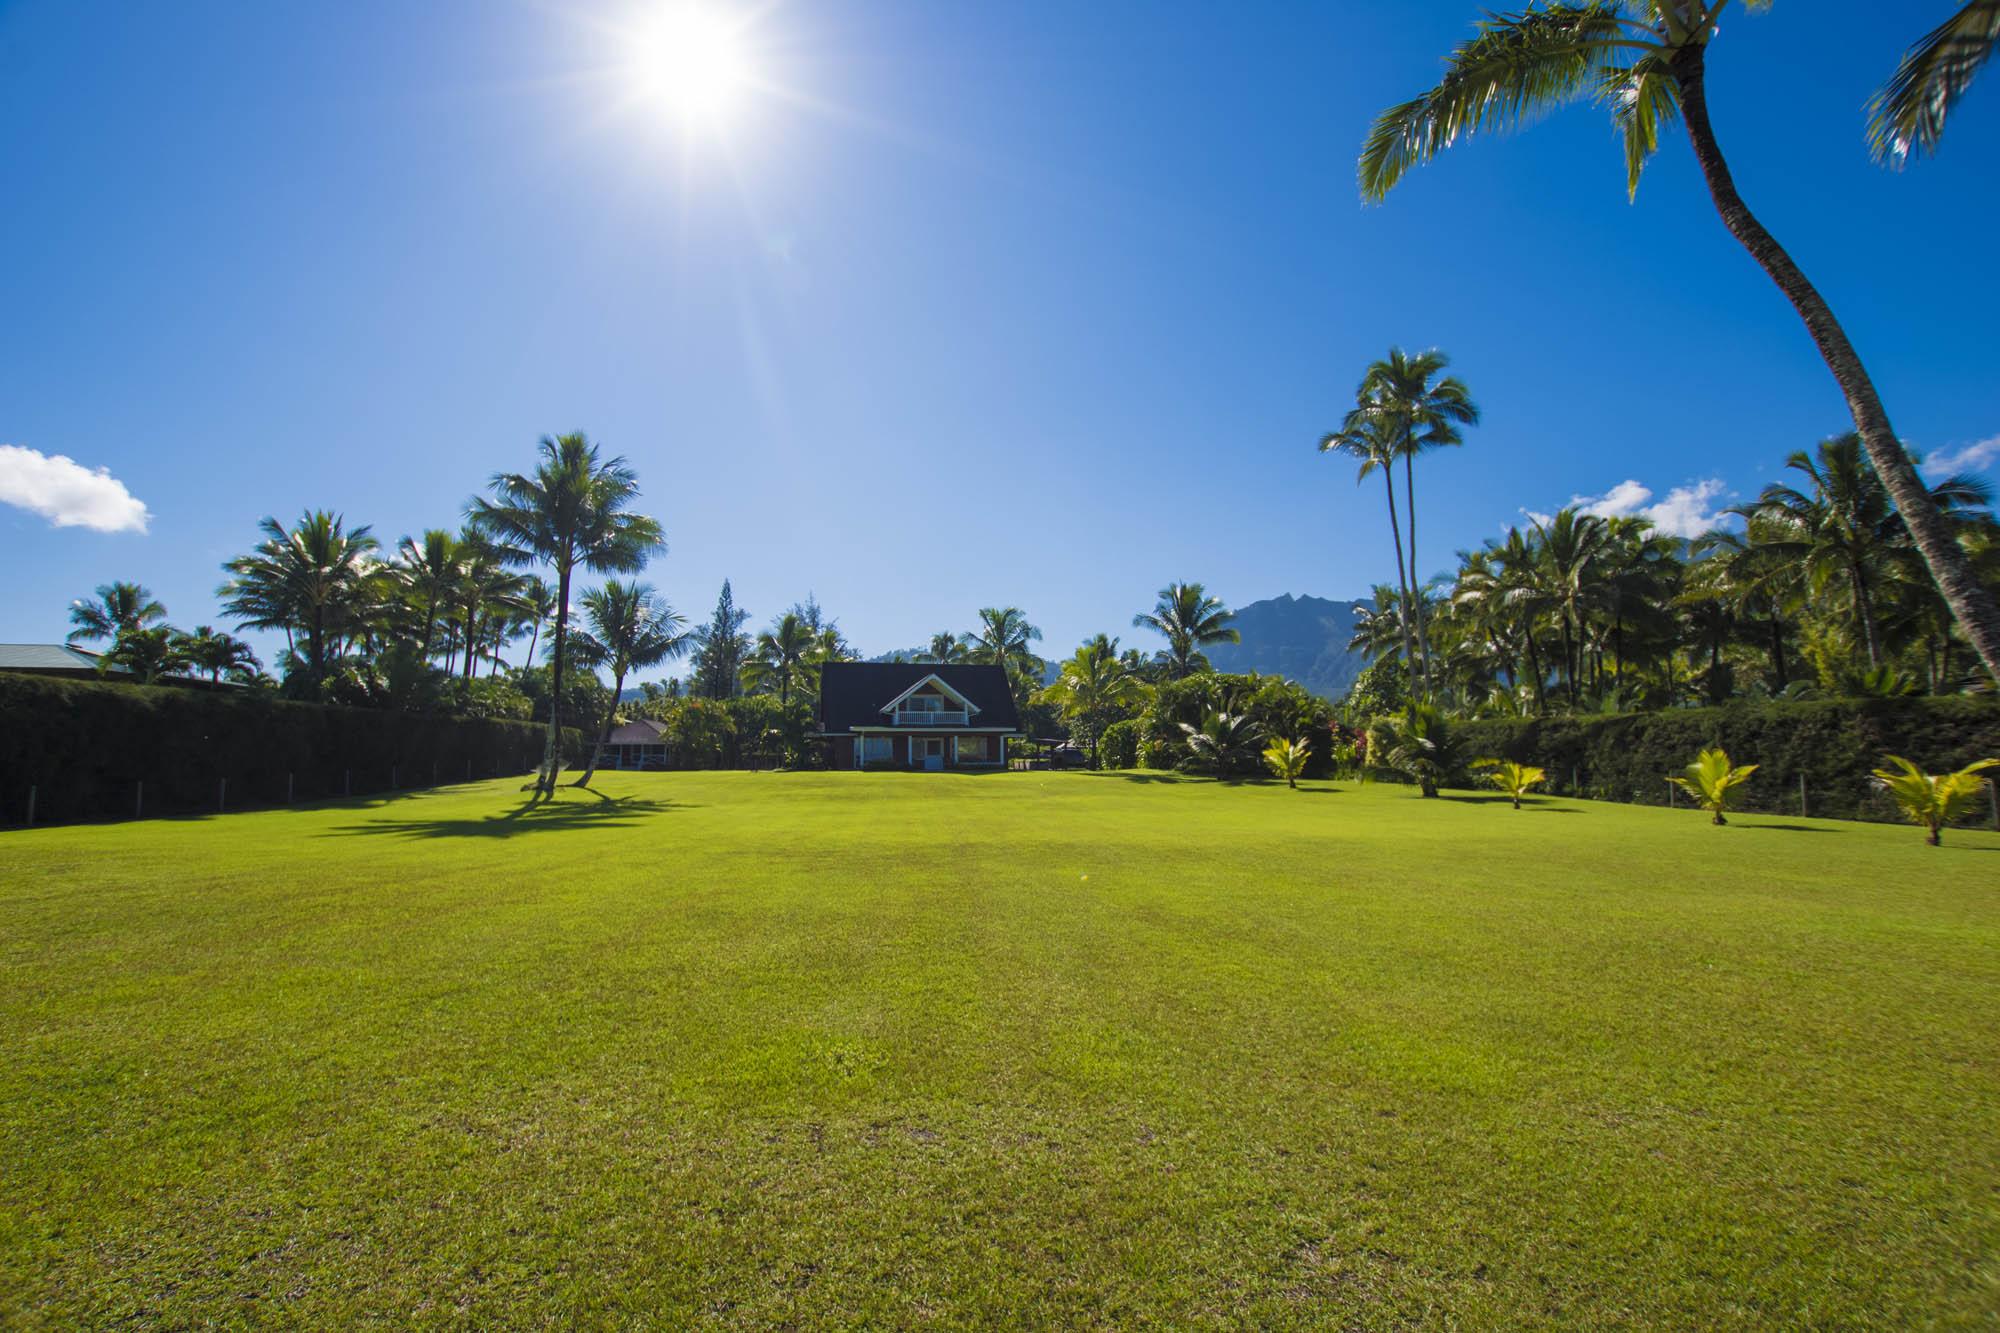 Kauai-217-Hanalei Bay4